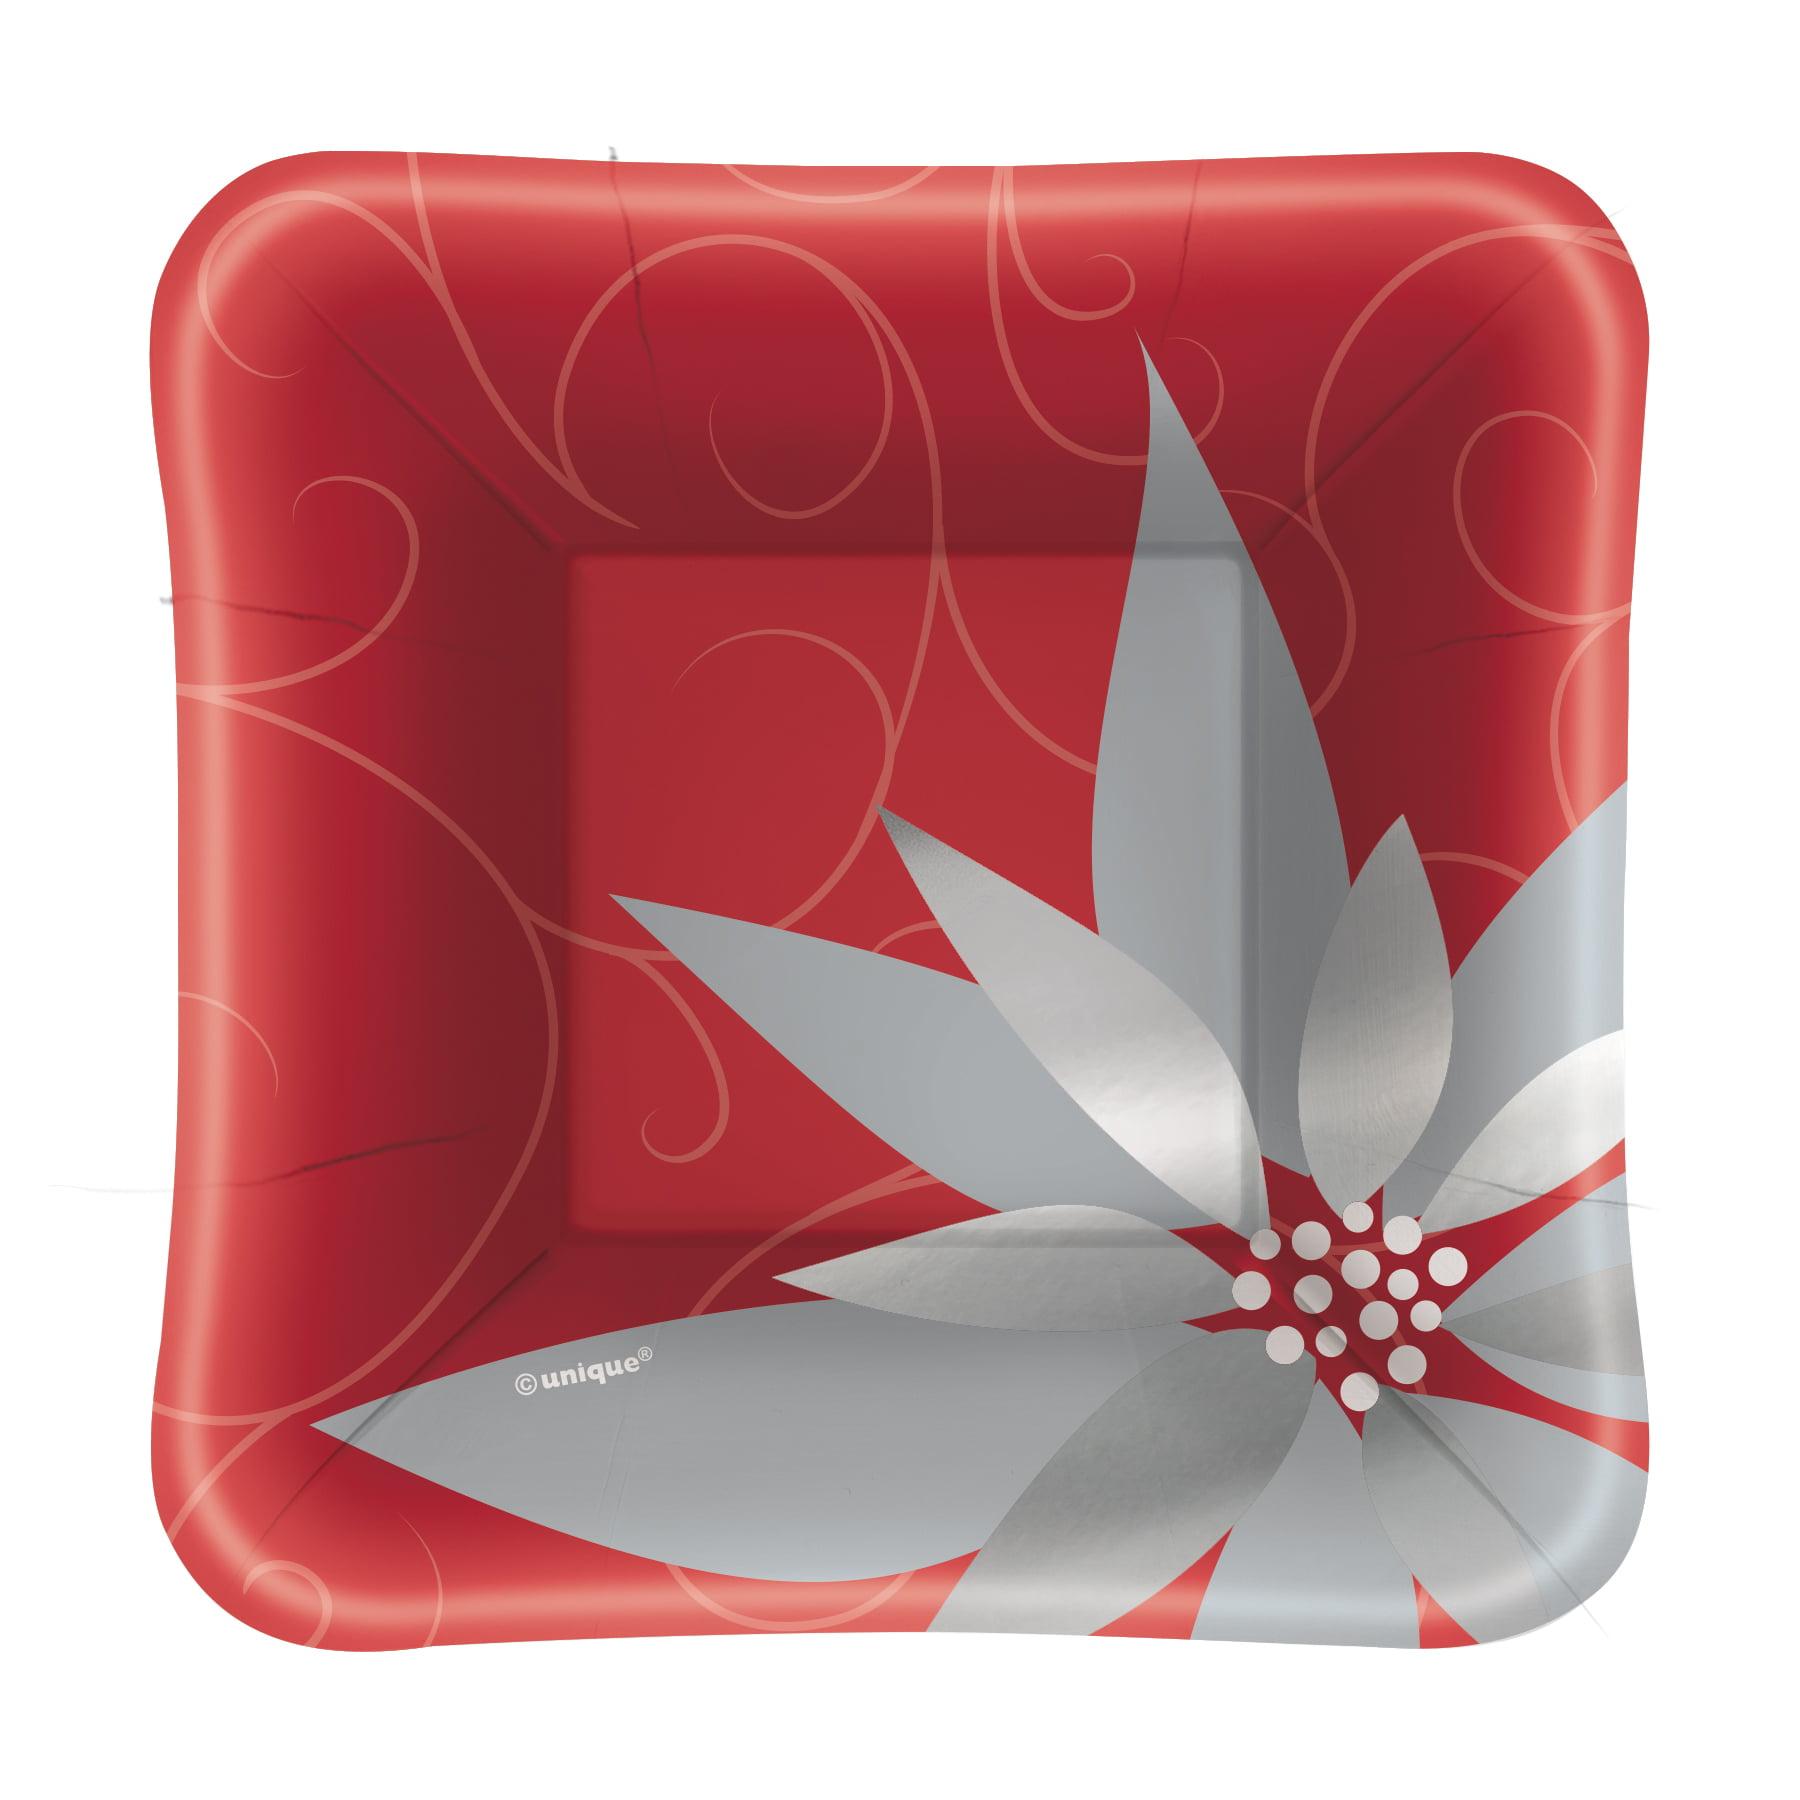 "5"" Foil Square Paper Appetizer Elegant Red Christmas Plates, 8ct"